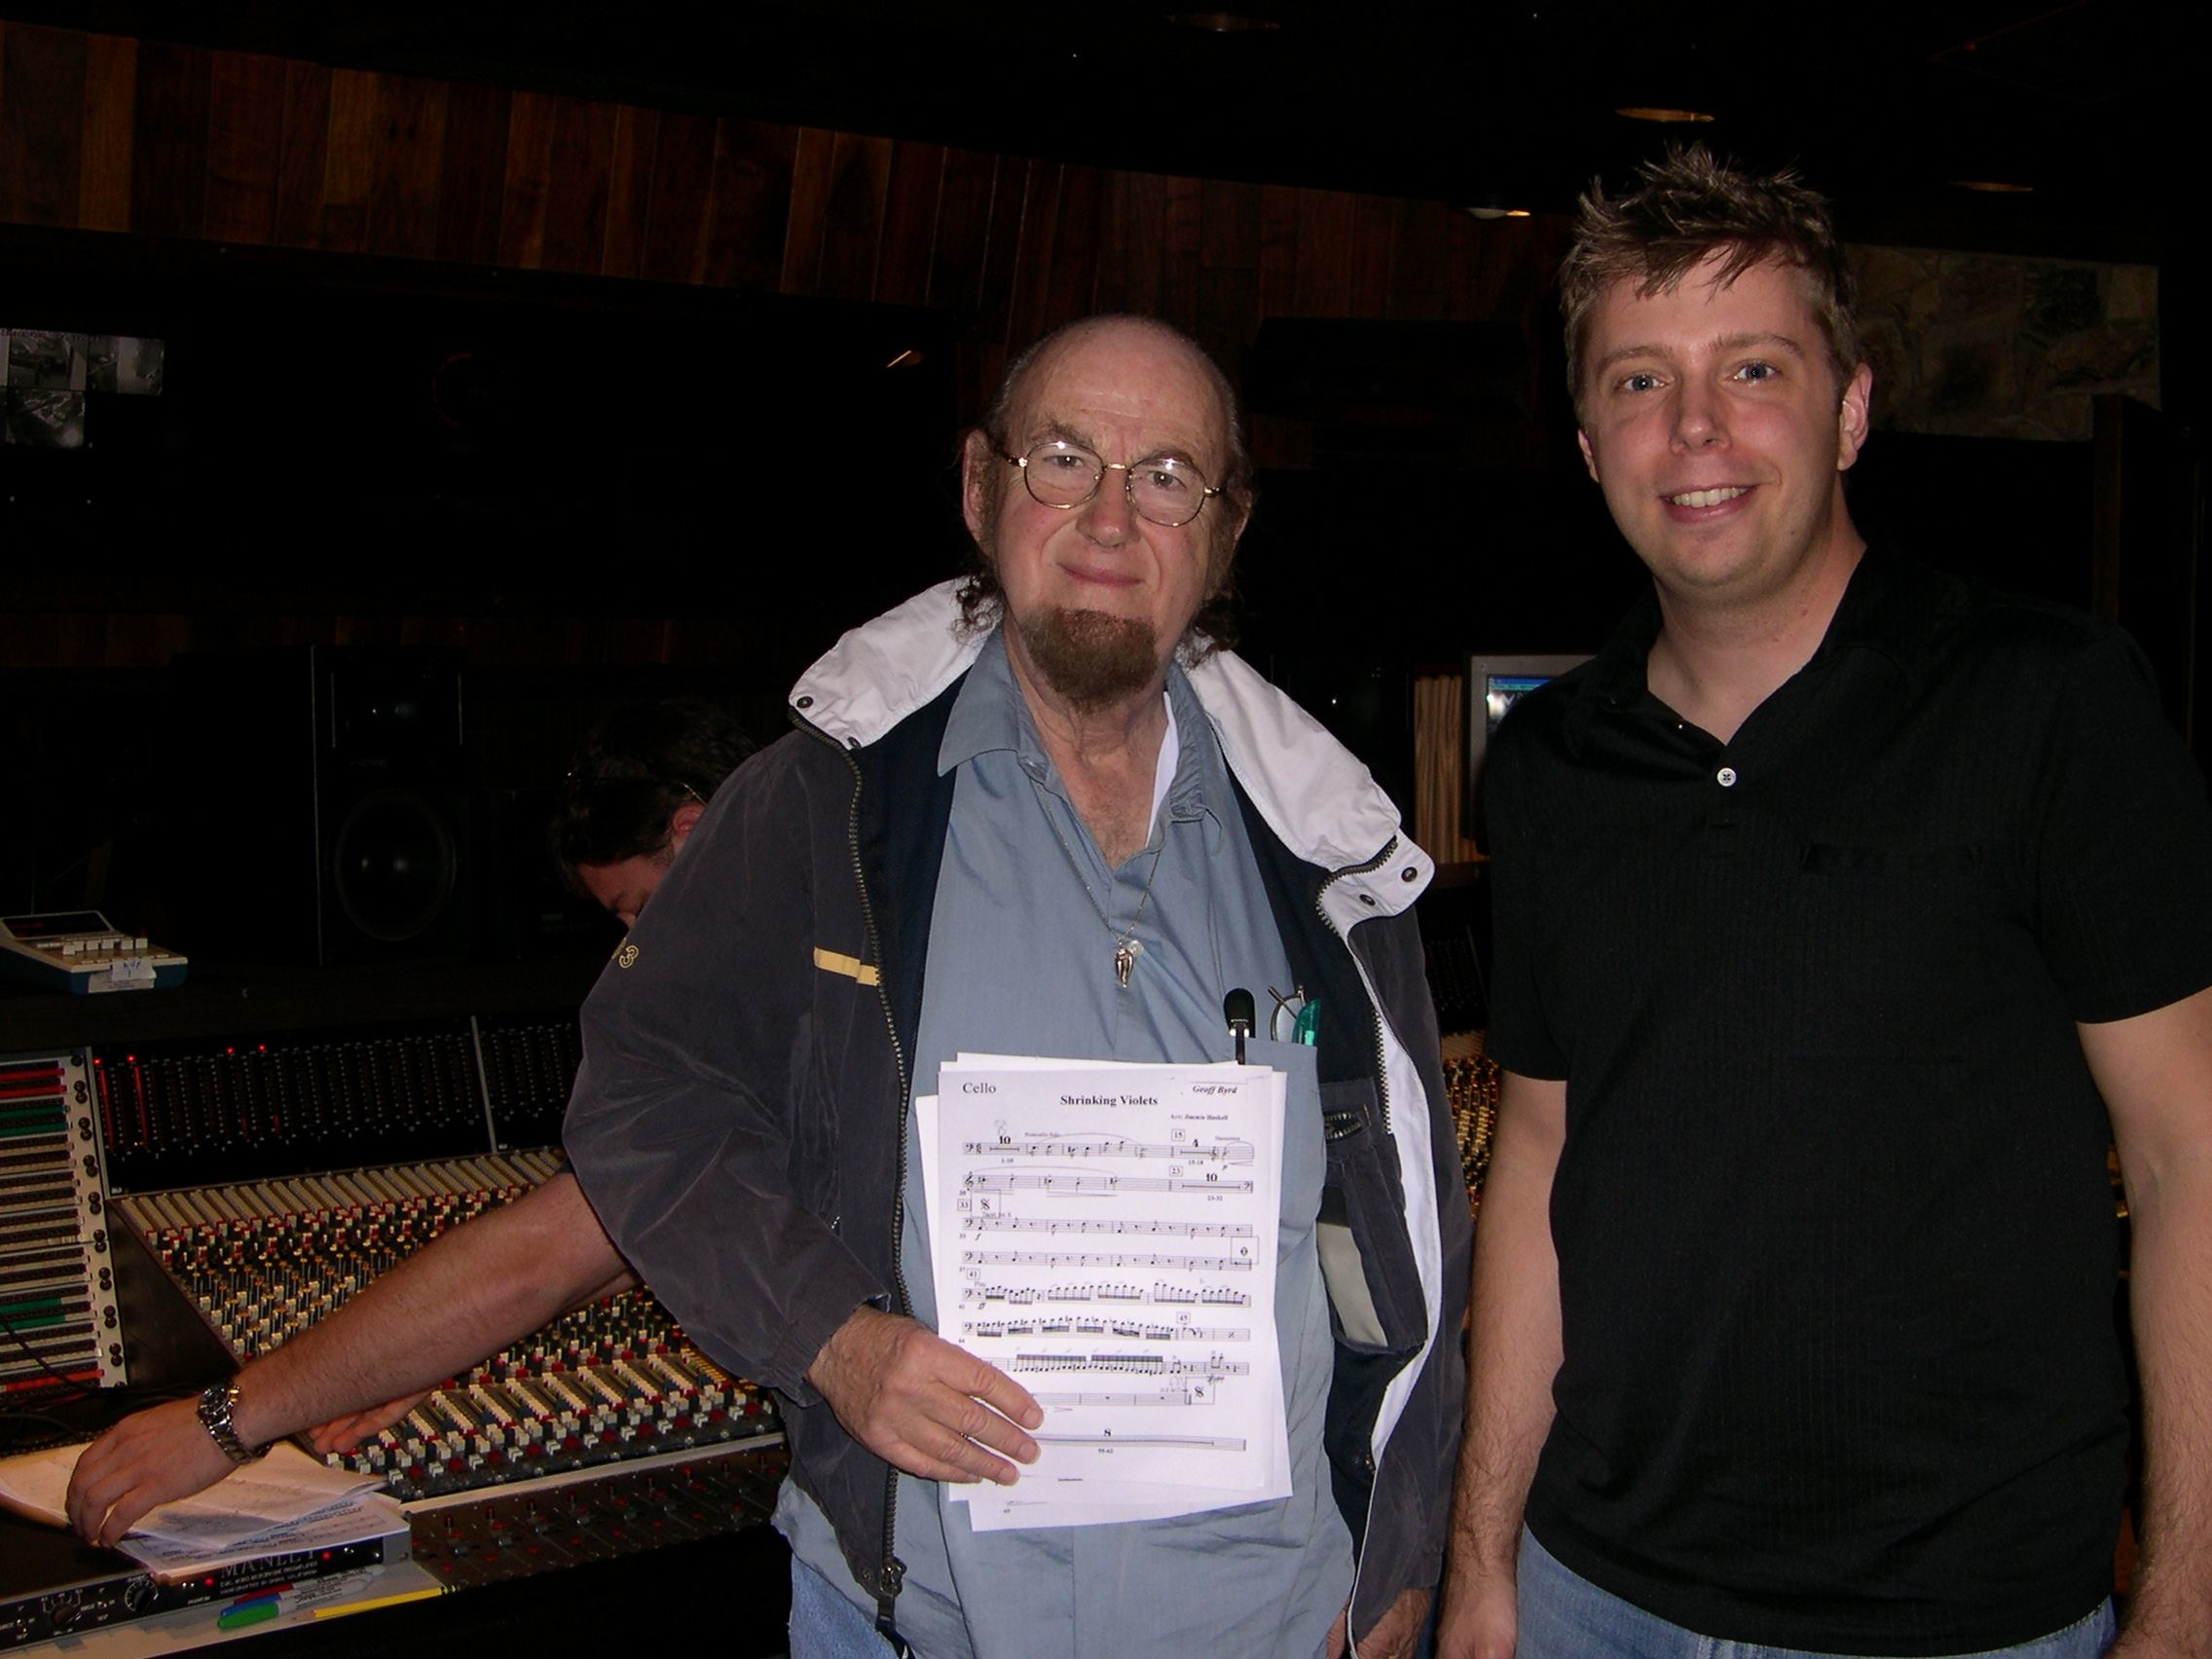 Steve with Grammy Award-Winning string arranger  Jimmie Haskell